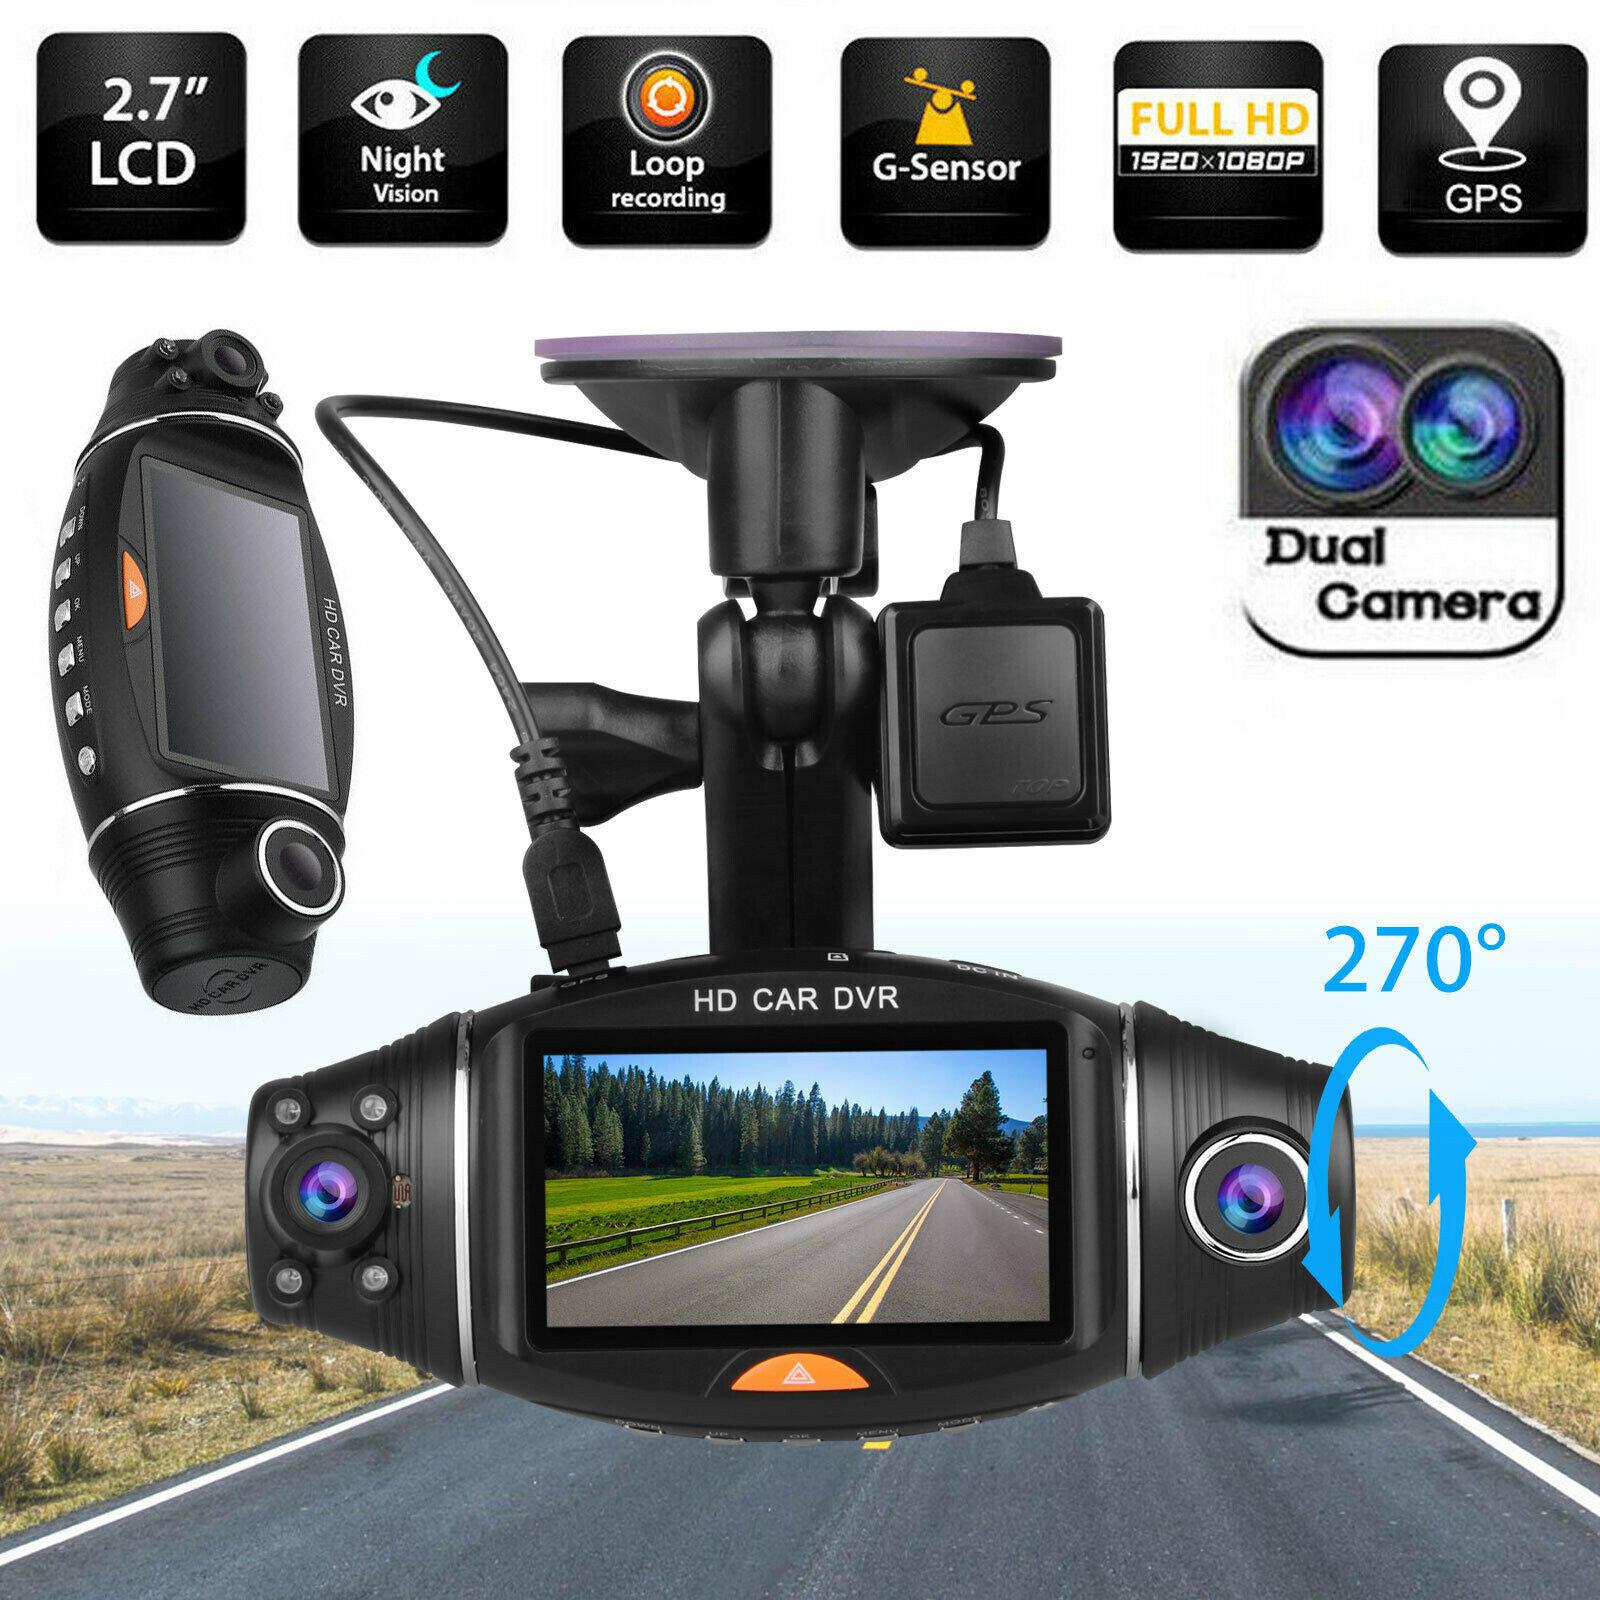 "Full HD 1080P 2.7"" Dual Lens Car DVR GPS Camera with Rear View Night Verison Camera Video Recorder G-Sensor Dash Cam Car DVRs"